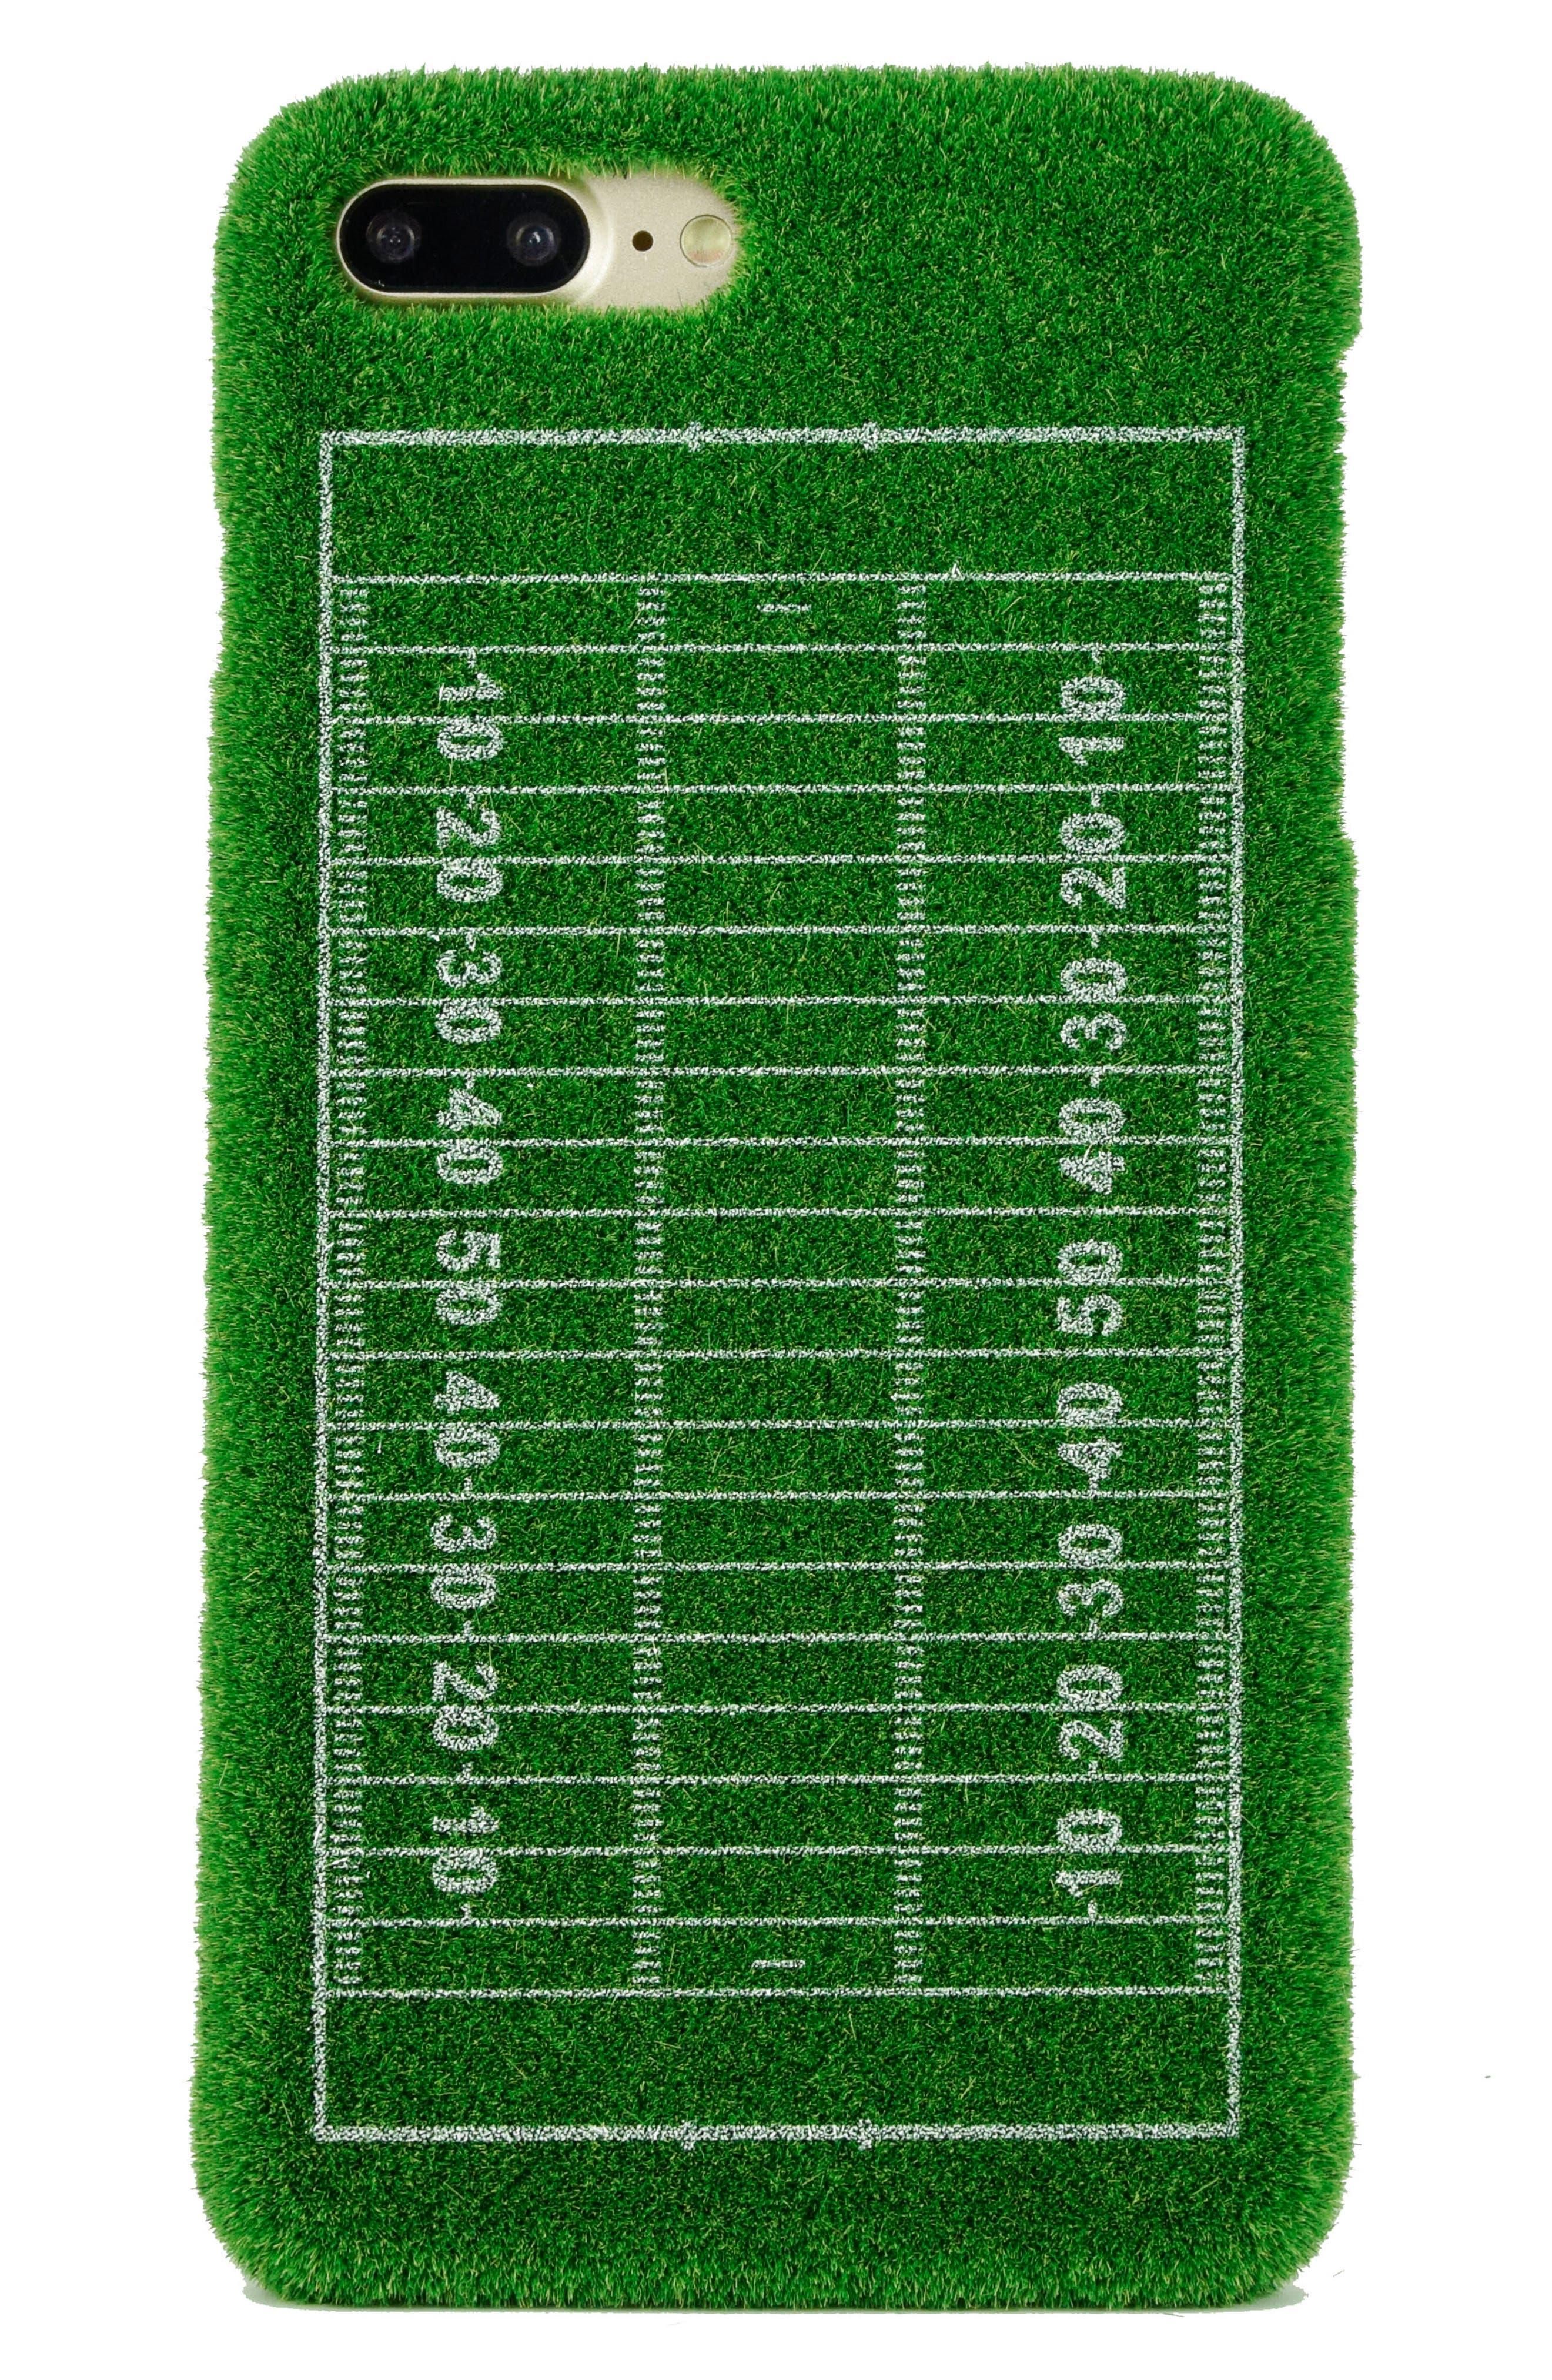 Alternate Image 1 Selected - Shibaful Super Bowl Portable Park iPhone 7 & iPhone 7 Plus Case